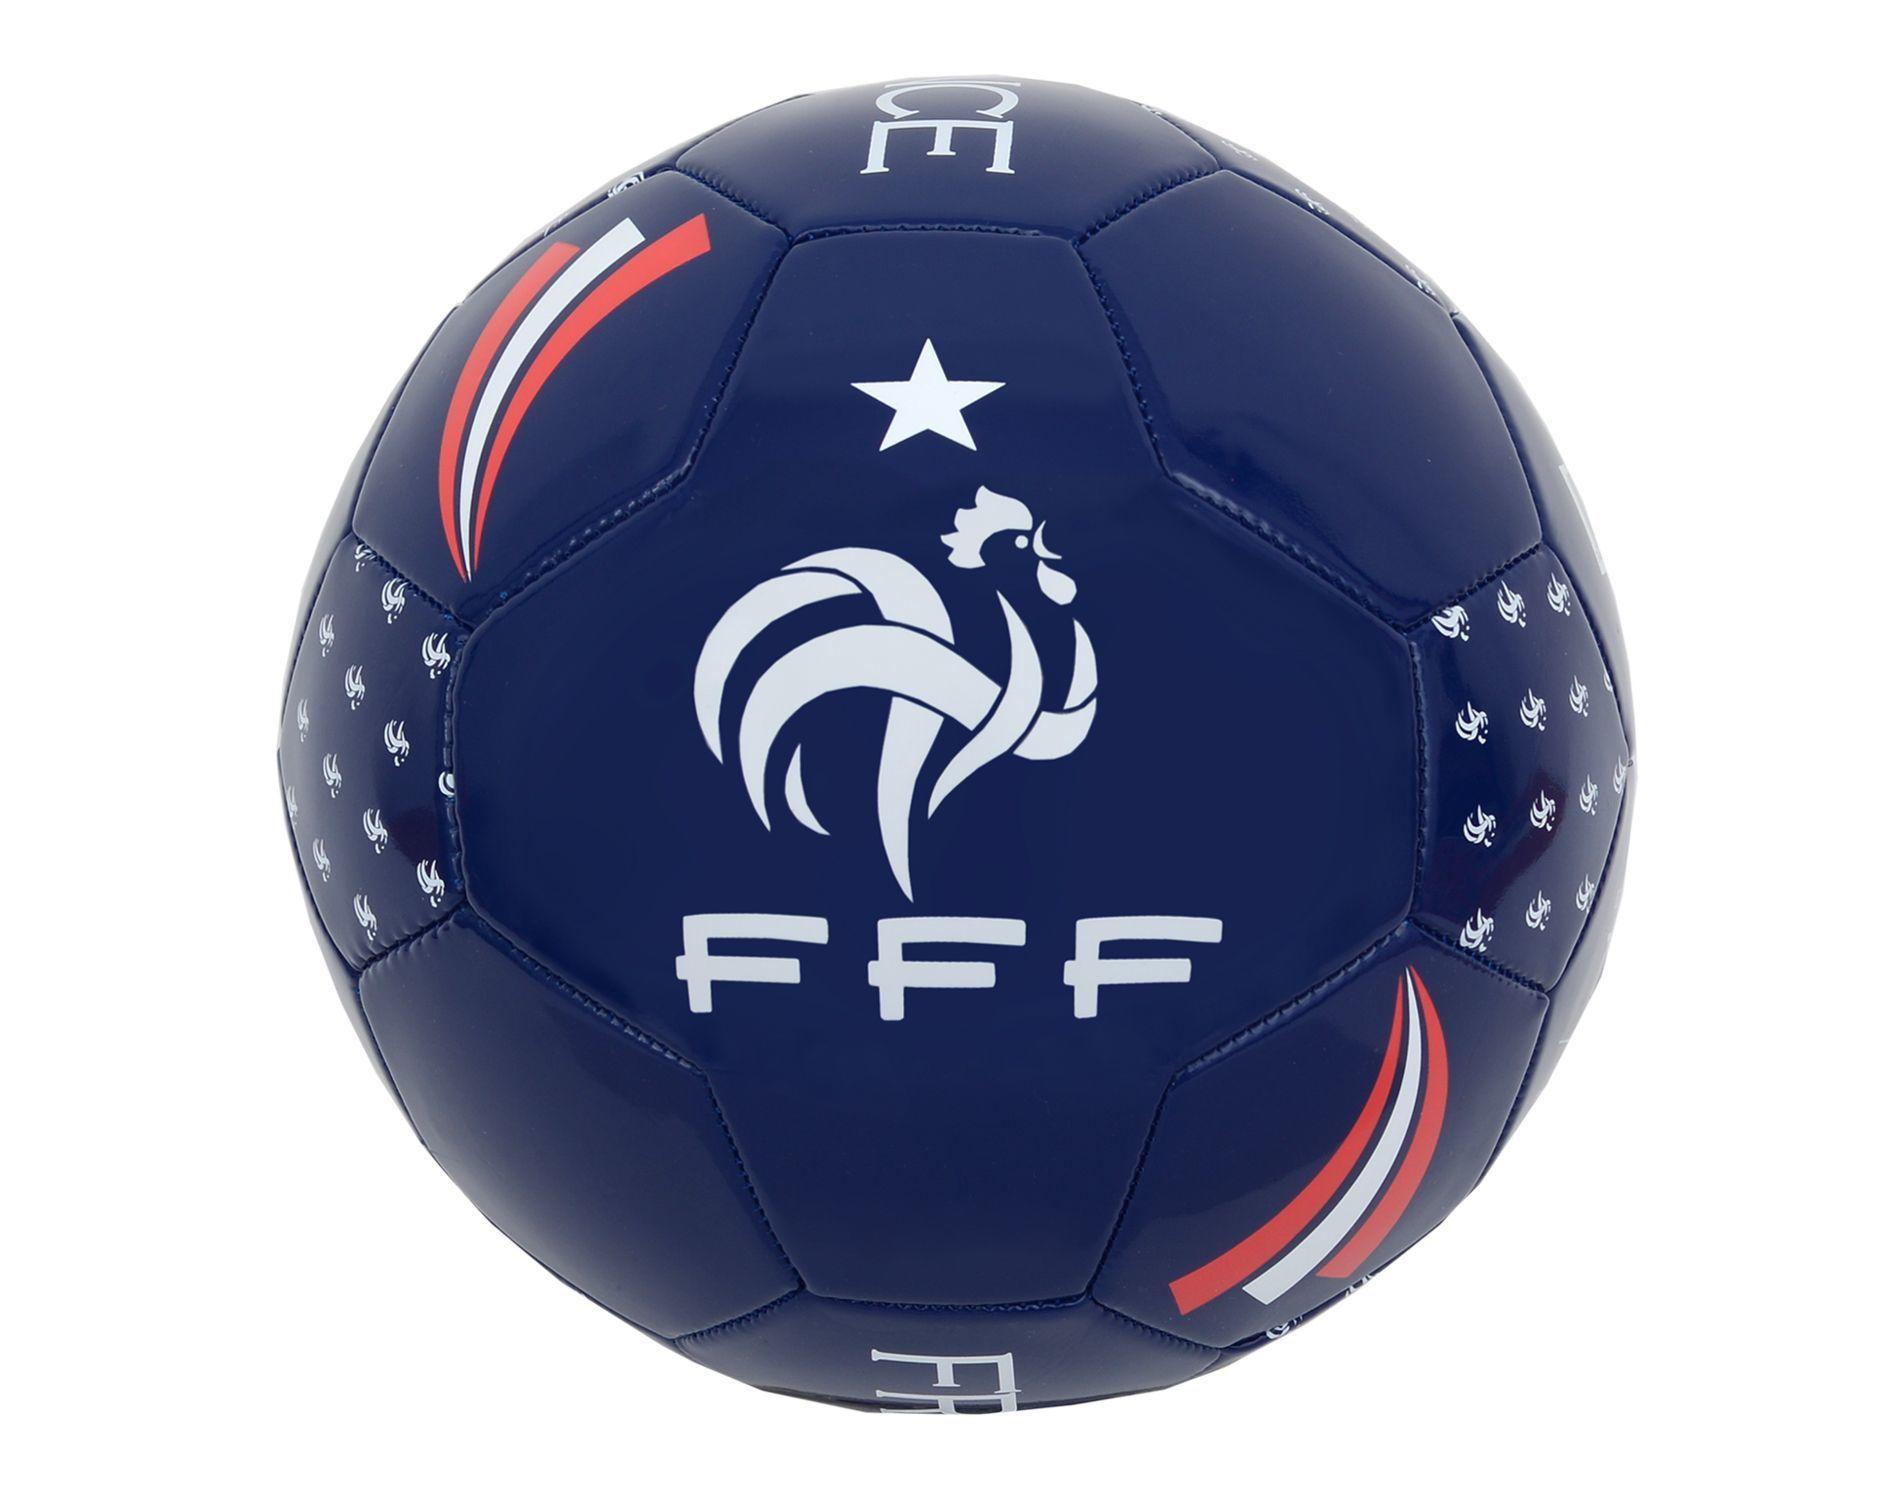 fff ballon de football taille 5 bleu pas cher. Black Bedroom Furniture Sets. Home Design Ideas